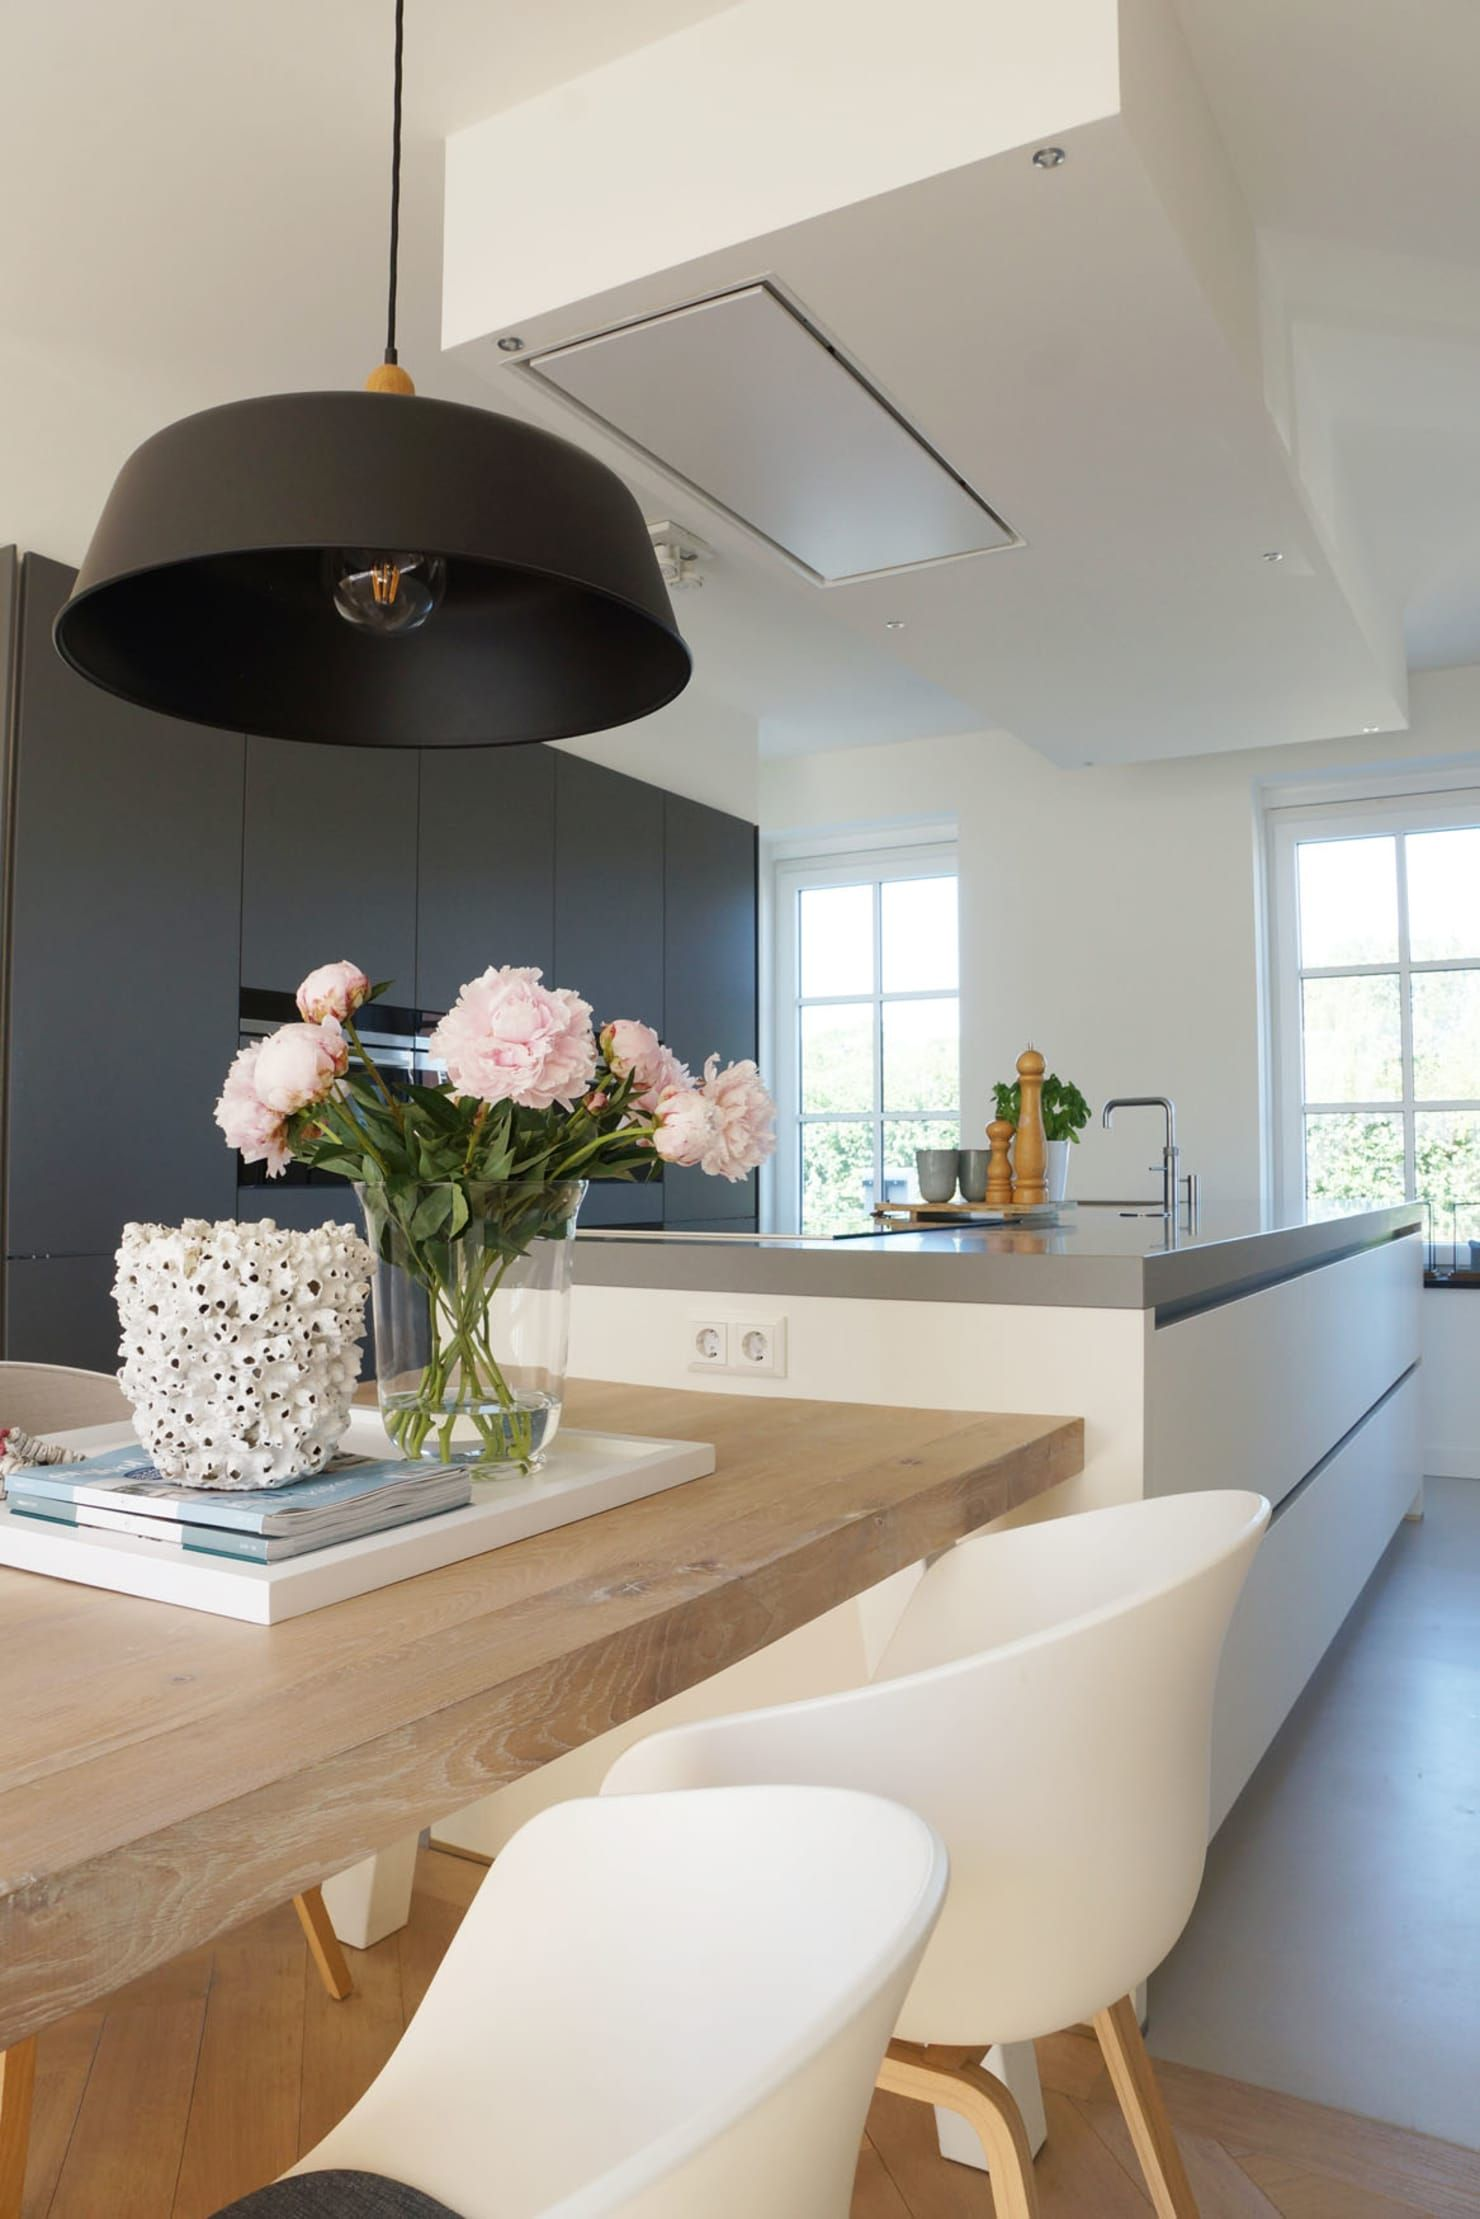 Keuken ontwerp breda interieurontwerp danielle verhelst moderne keukens van danielle verhelst interieurontwerp & realisatie modern | homify